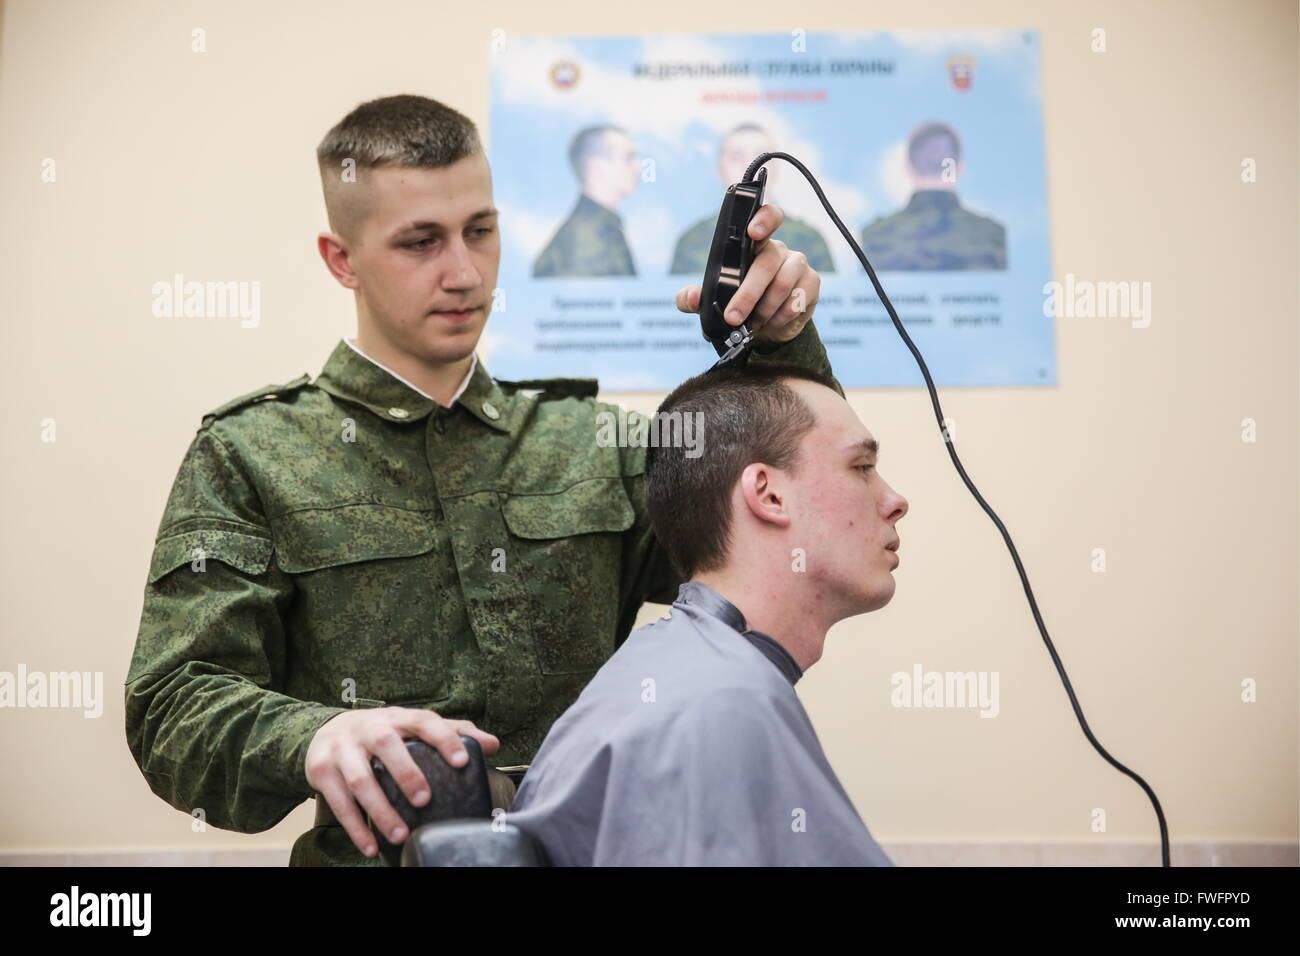 die 20 besten ideen für soldaten haarschnitt - beste